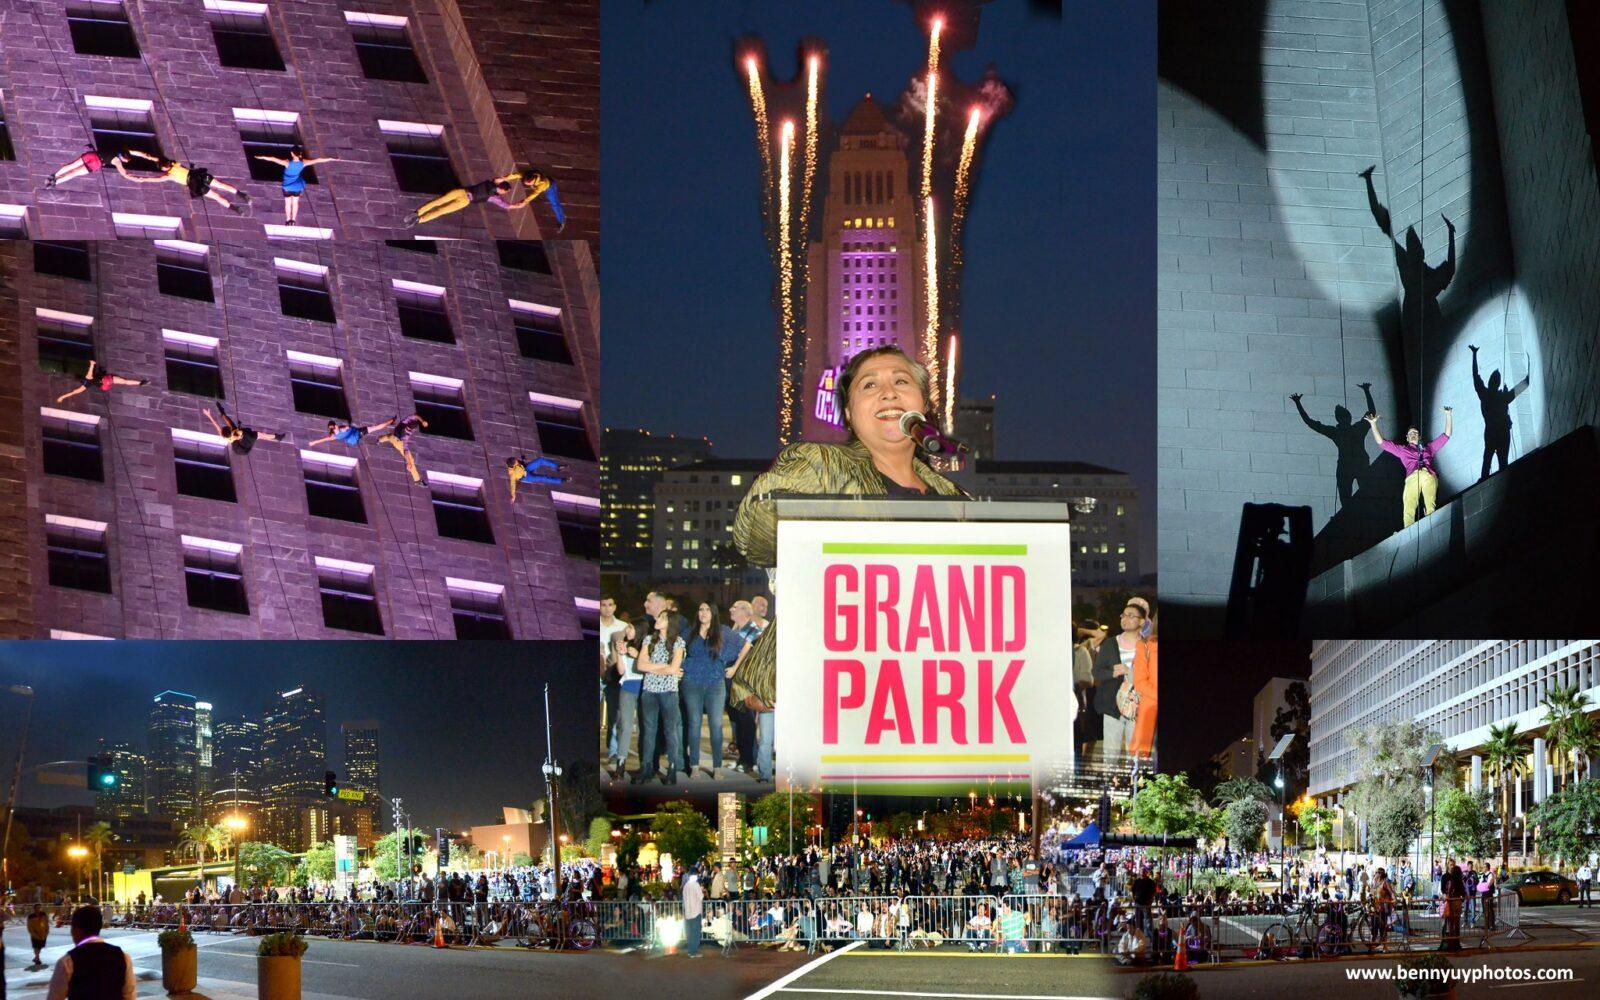 Los Angeles Grand Park opening led by Bandaloop